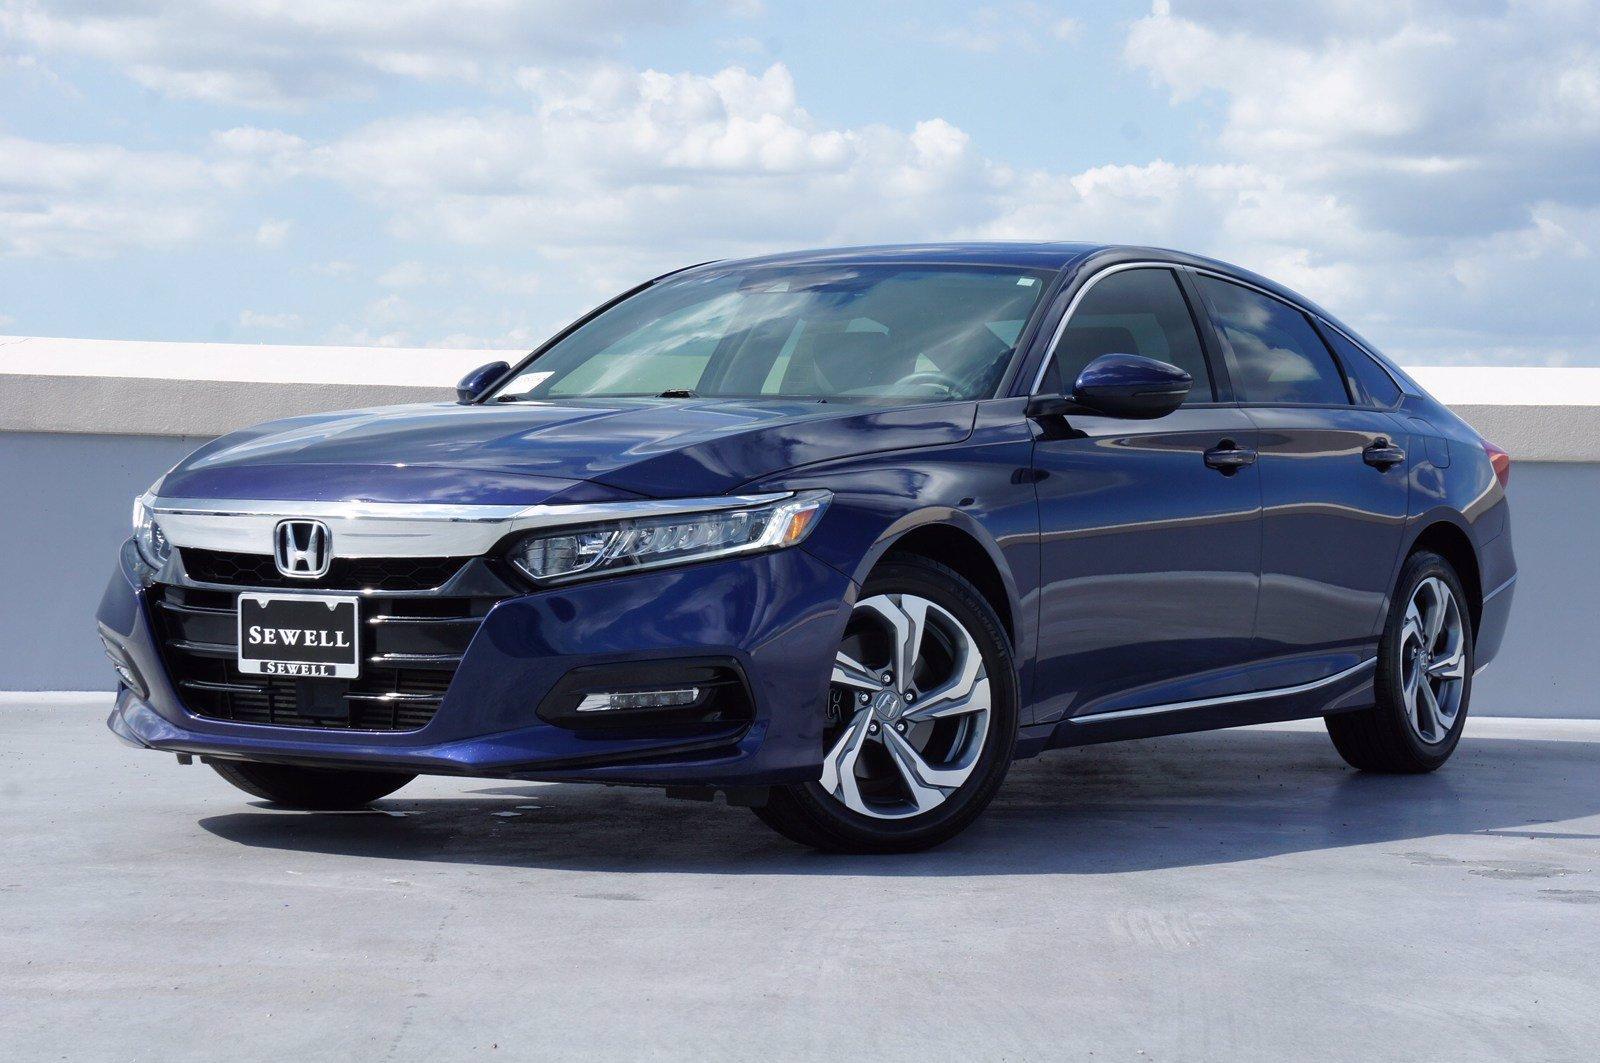 2019 Honda Accord Sedan Vehicle Photo in Dallas, TX 75209